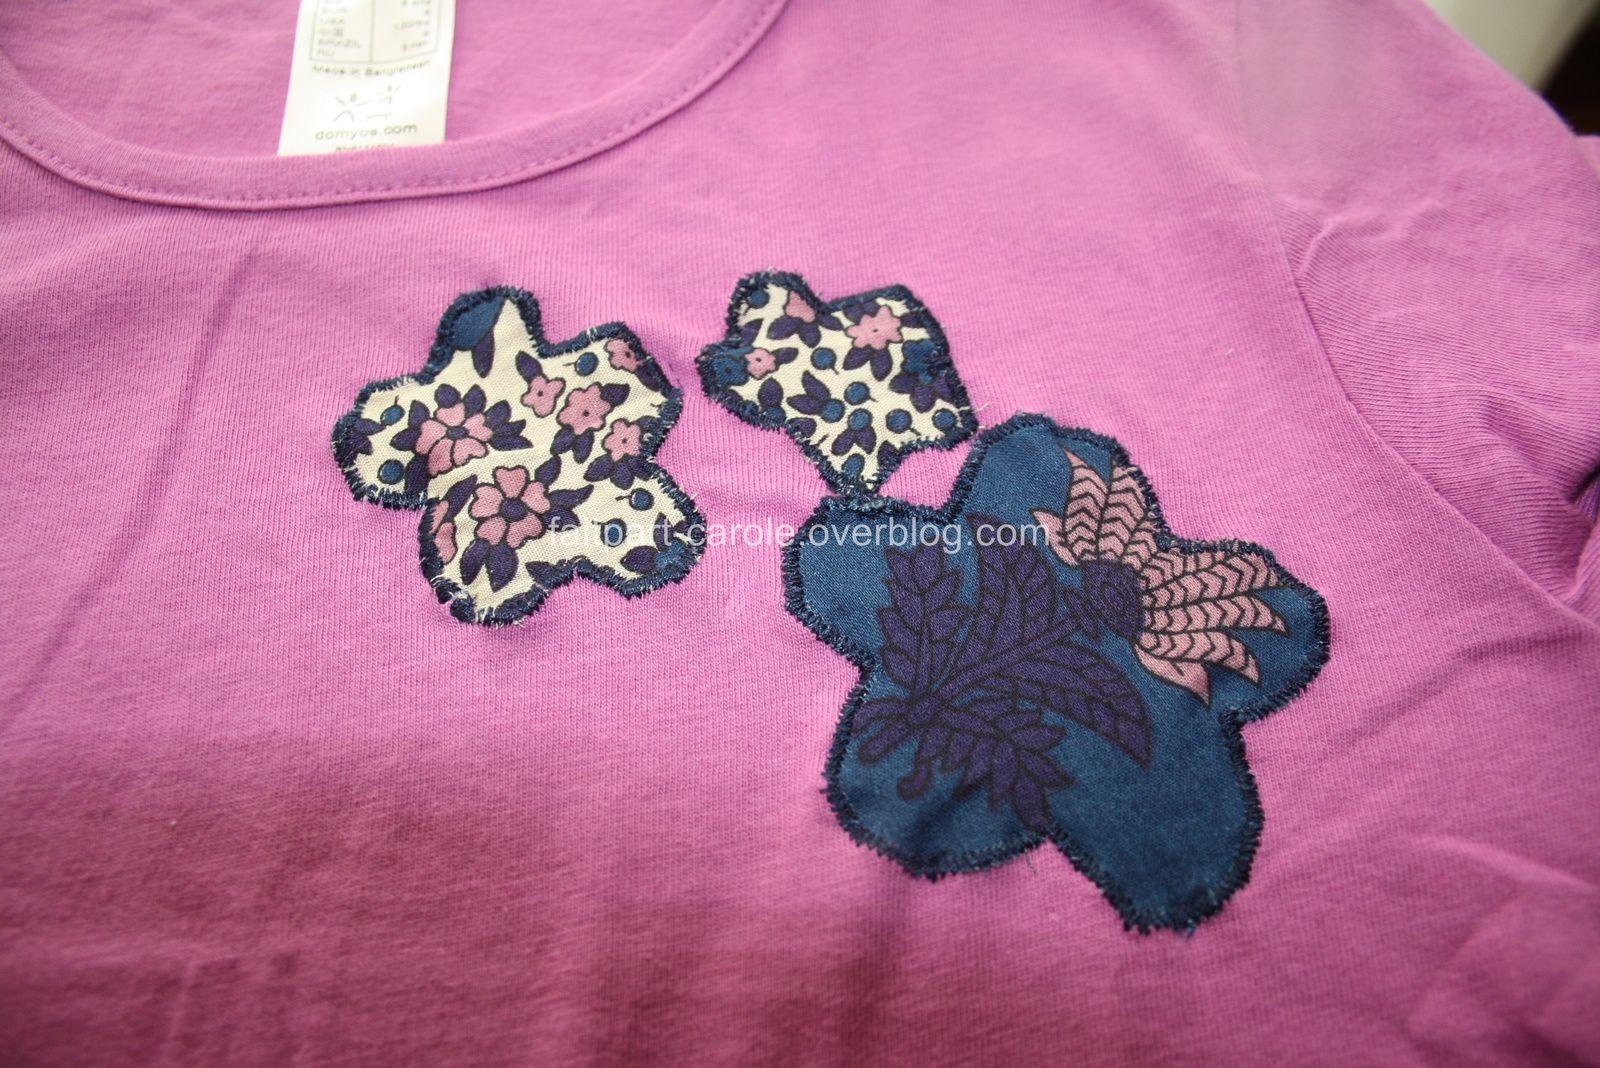 tee-shirt personnalisé couture